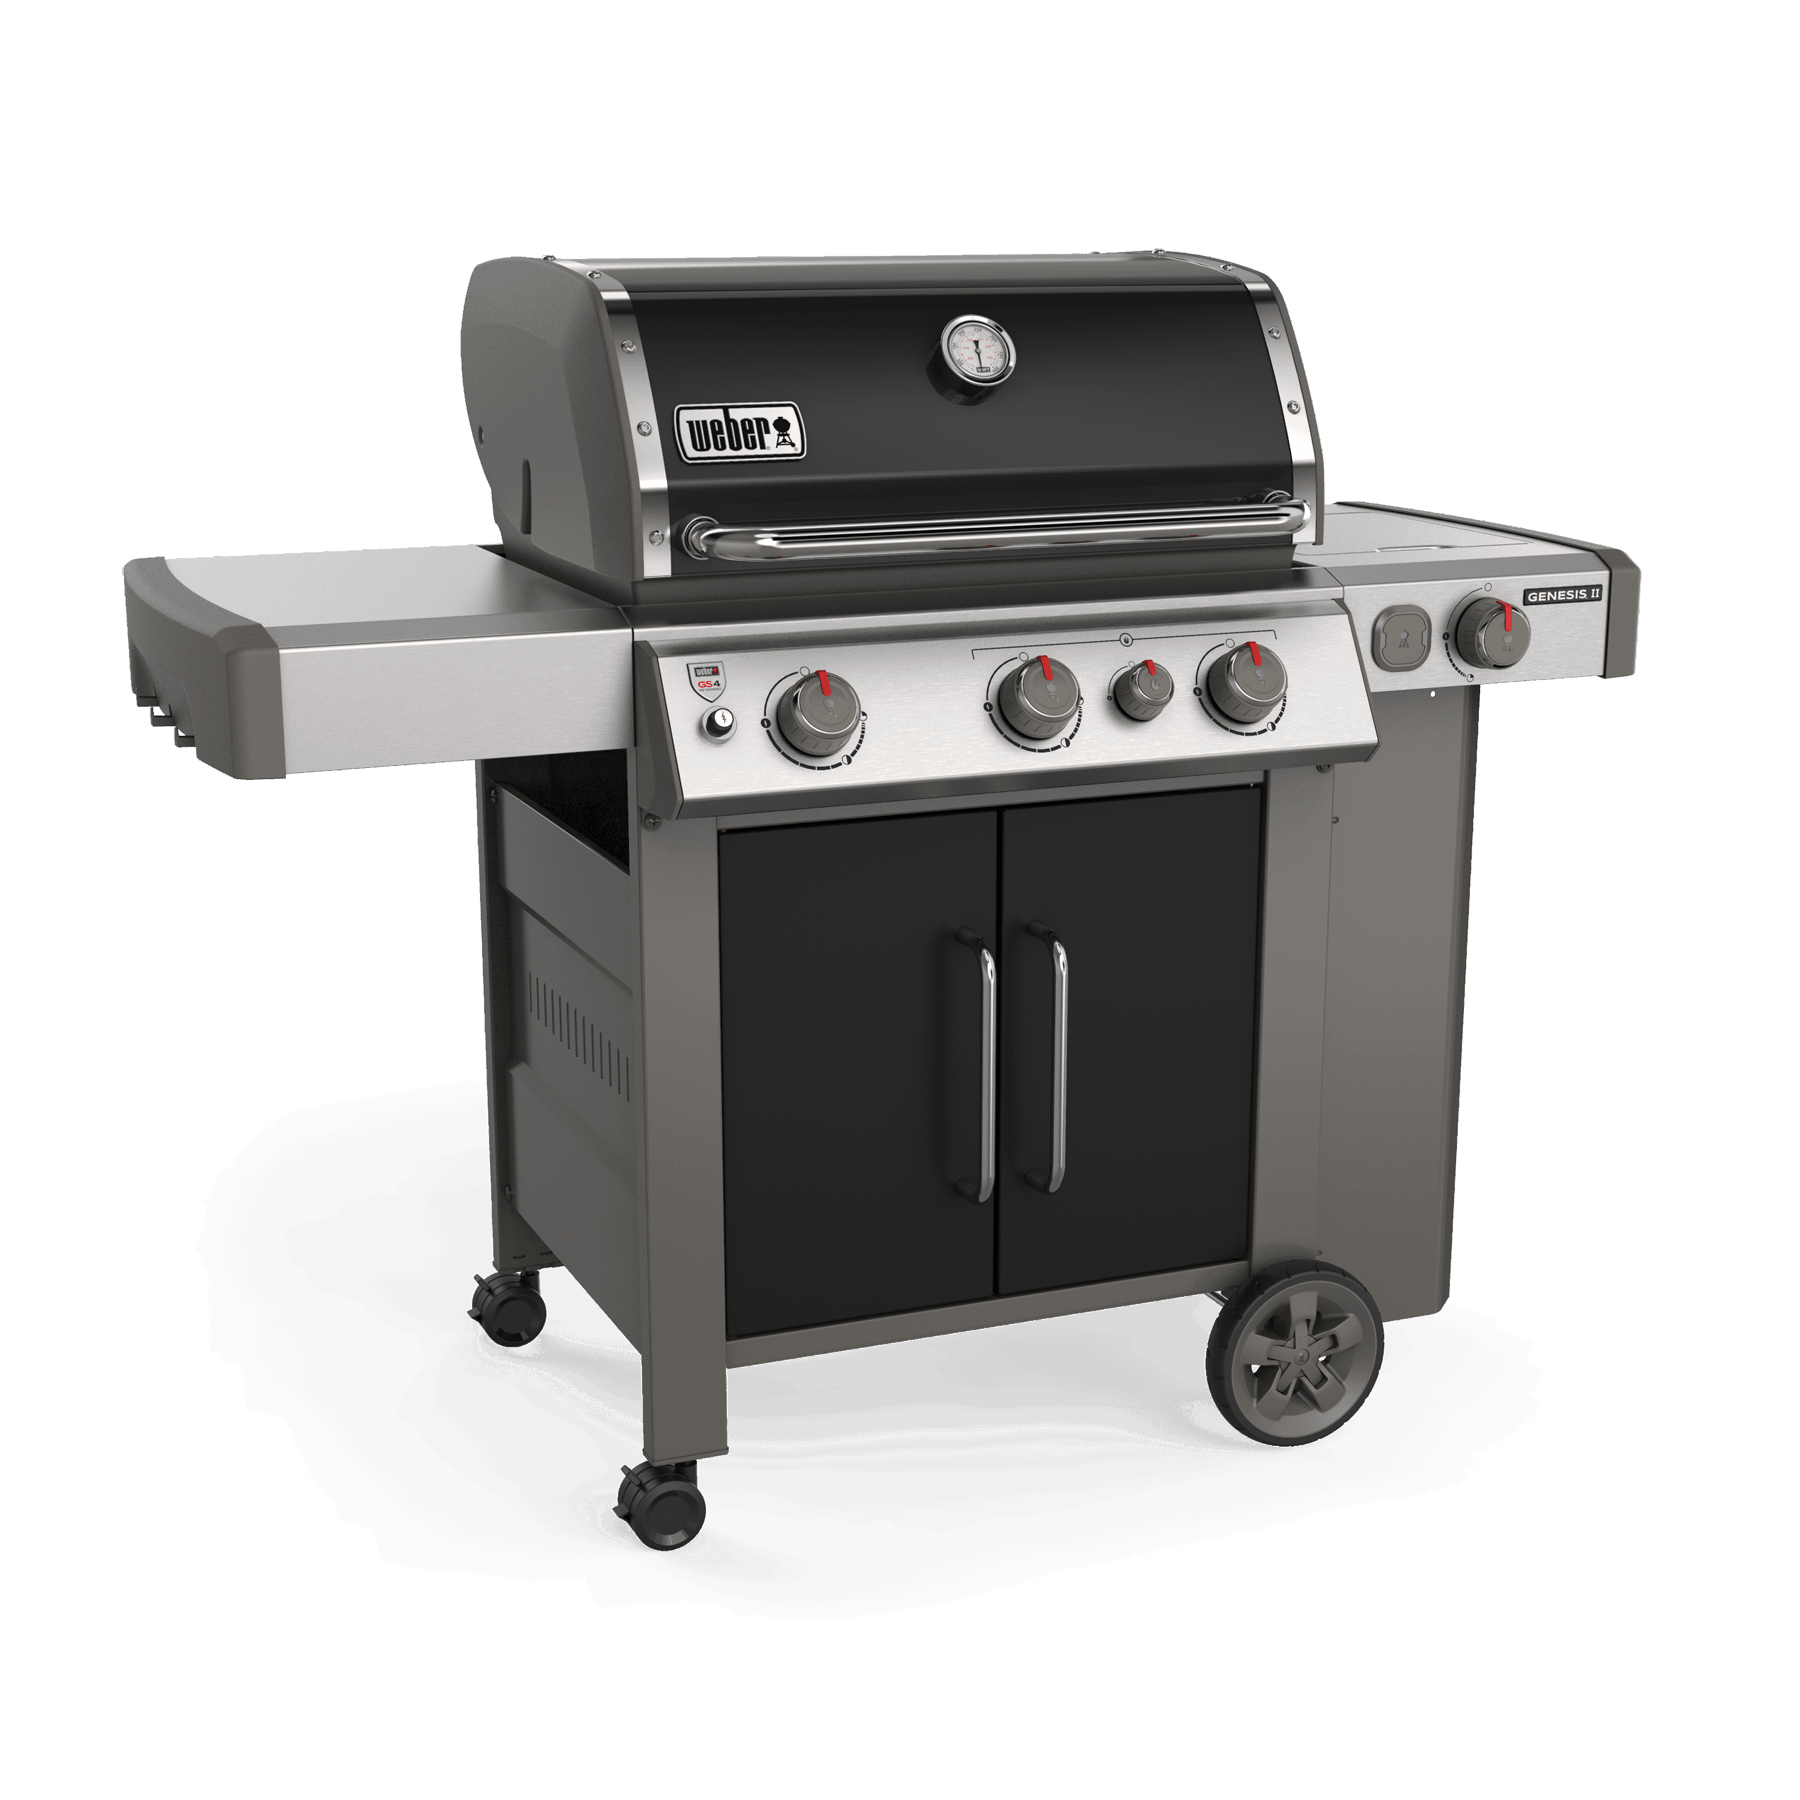 Genesis® II EP-335 GBS gasbarbecue